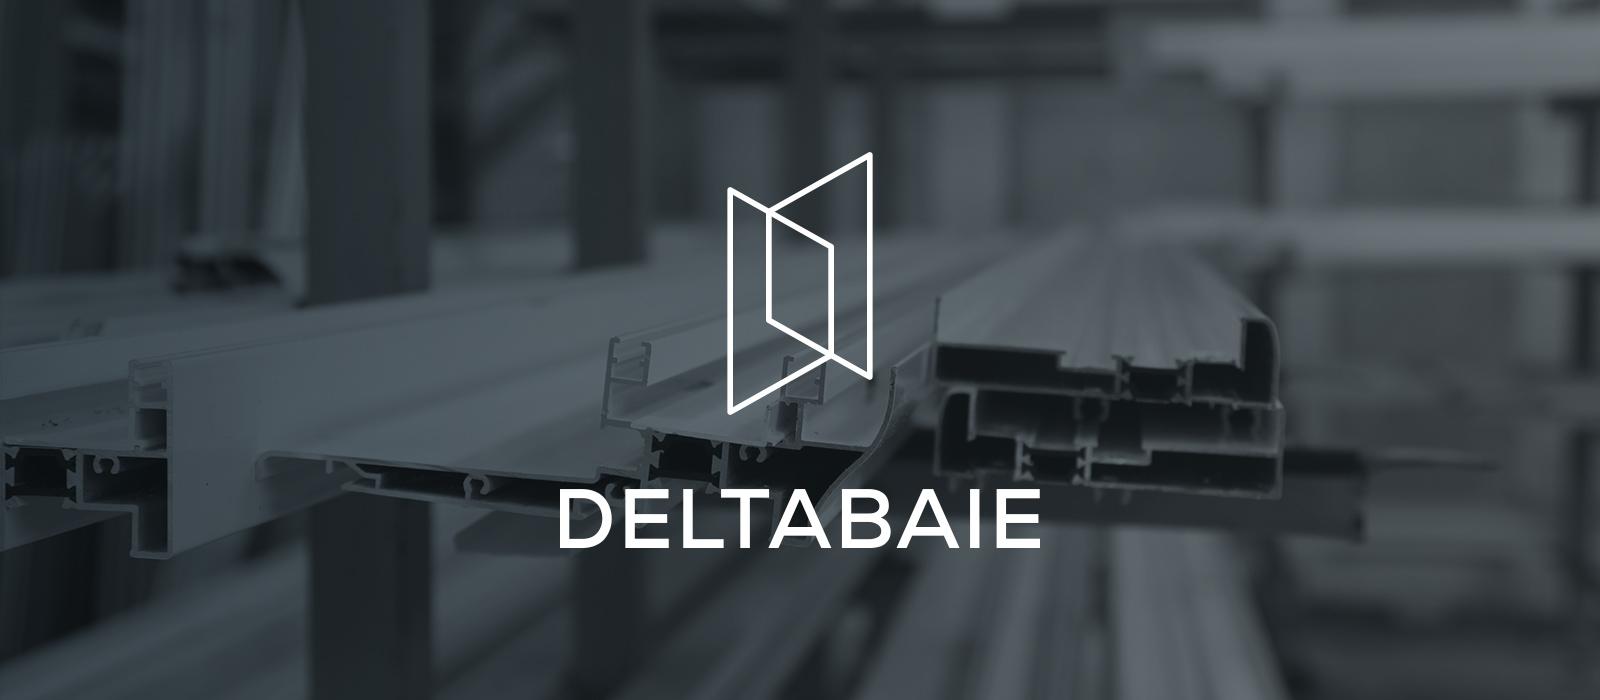 deltabaie-logotype